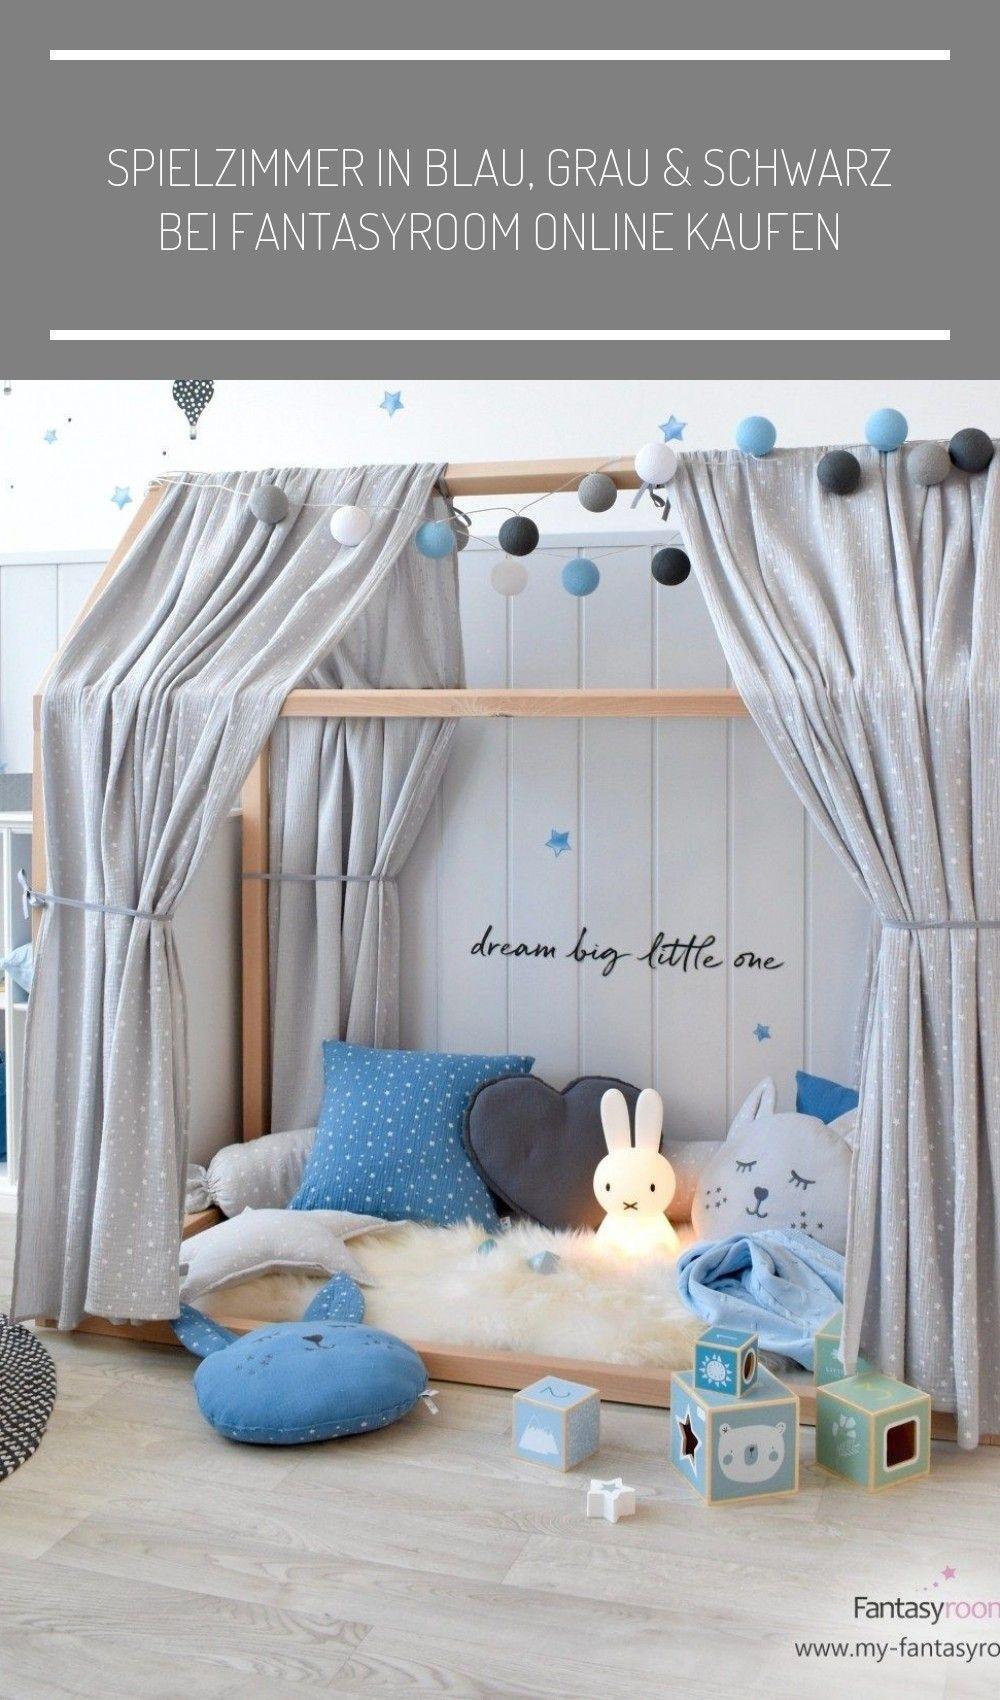 Full Size of Jungen Kinderzimmer In Blau Regale Regal Sofa Weiß Kinderzimmer Jungen Kinderzimmer